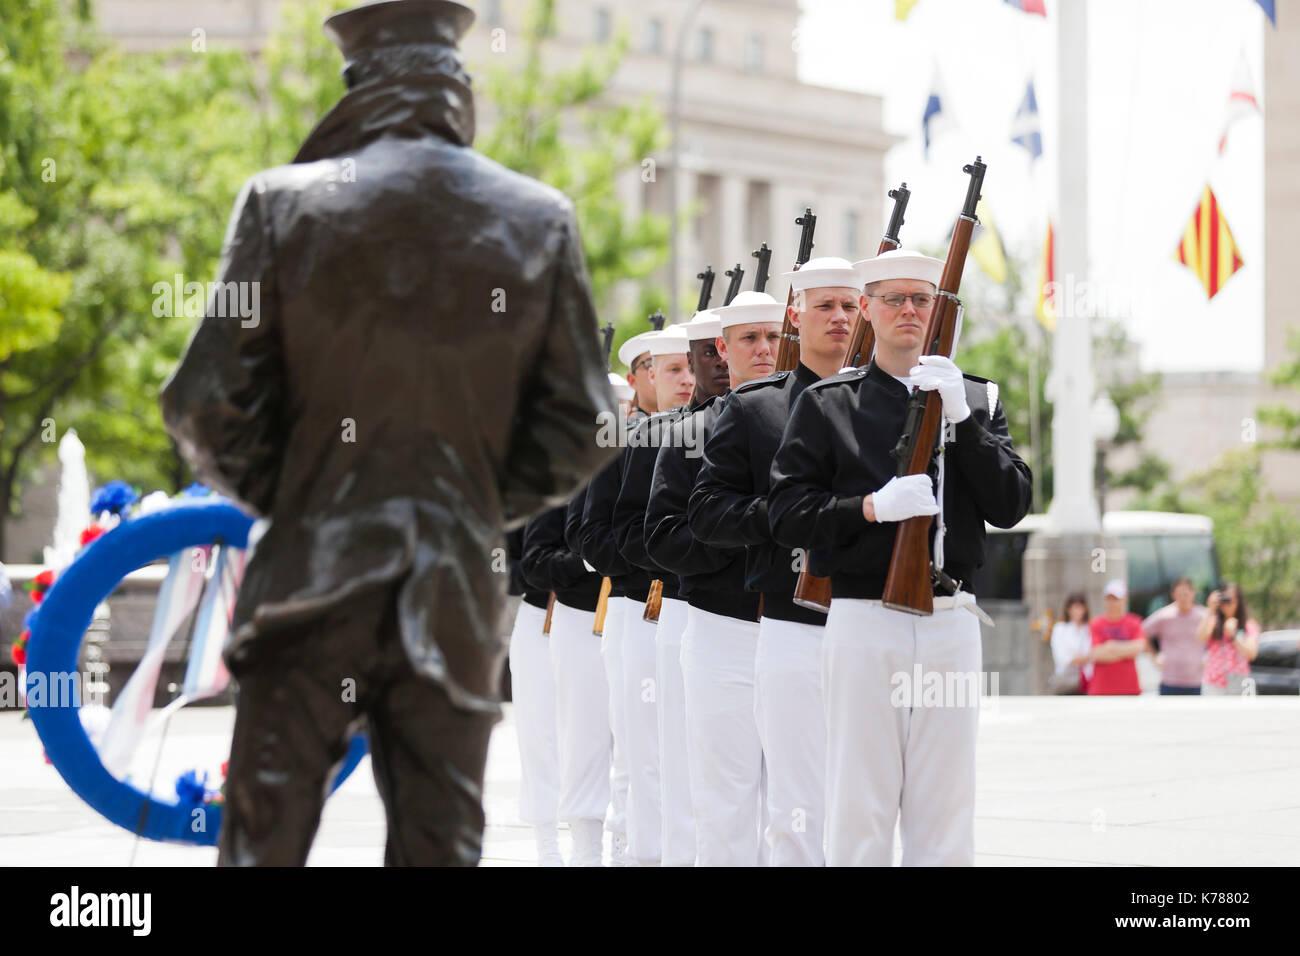 Navy ceremonial guard sailors full honors ceremony at the US Navy Memorial - Washington, DC USA - Stock Image